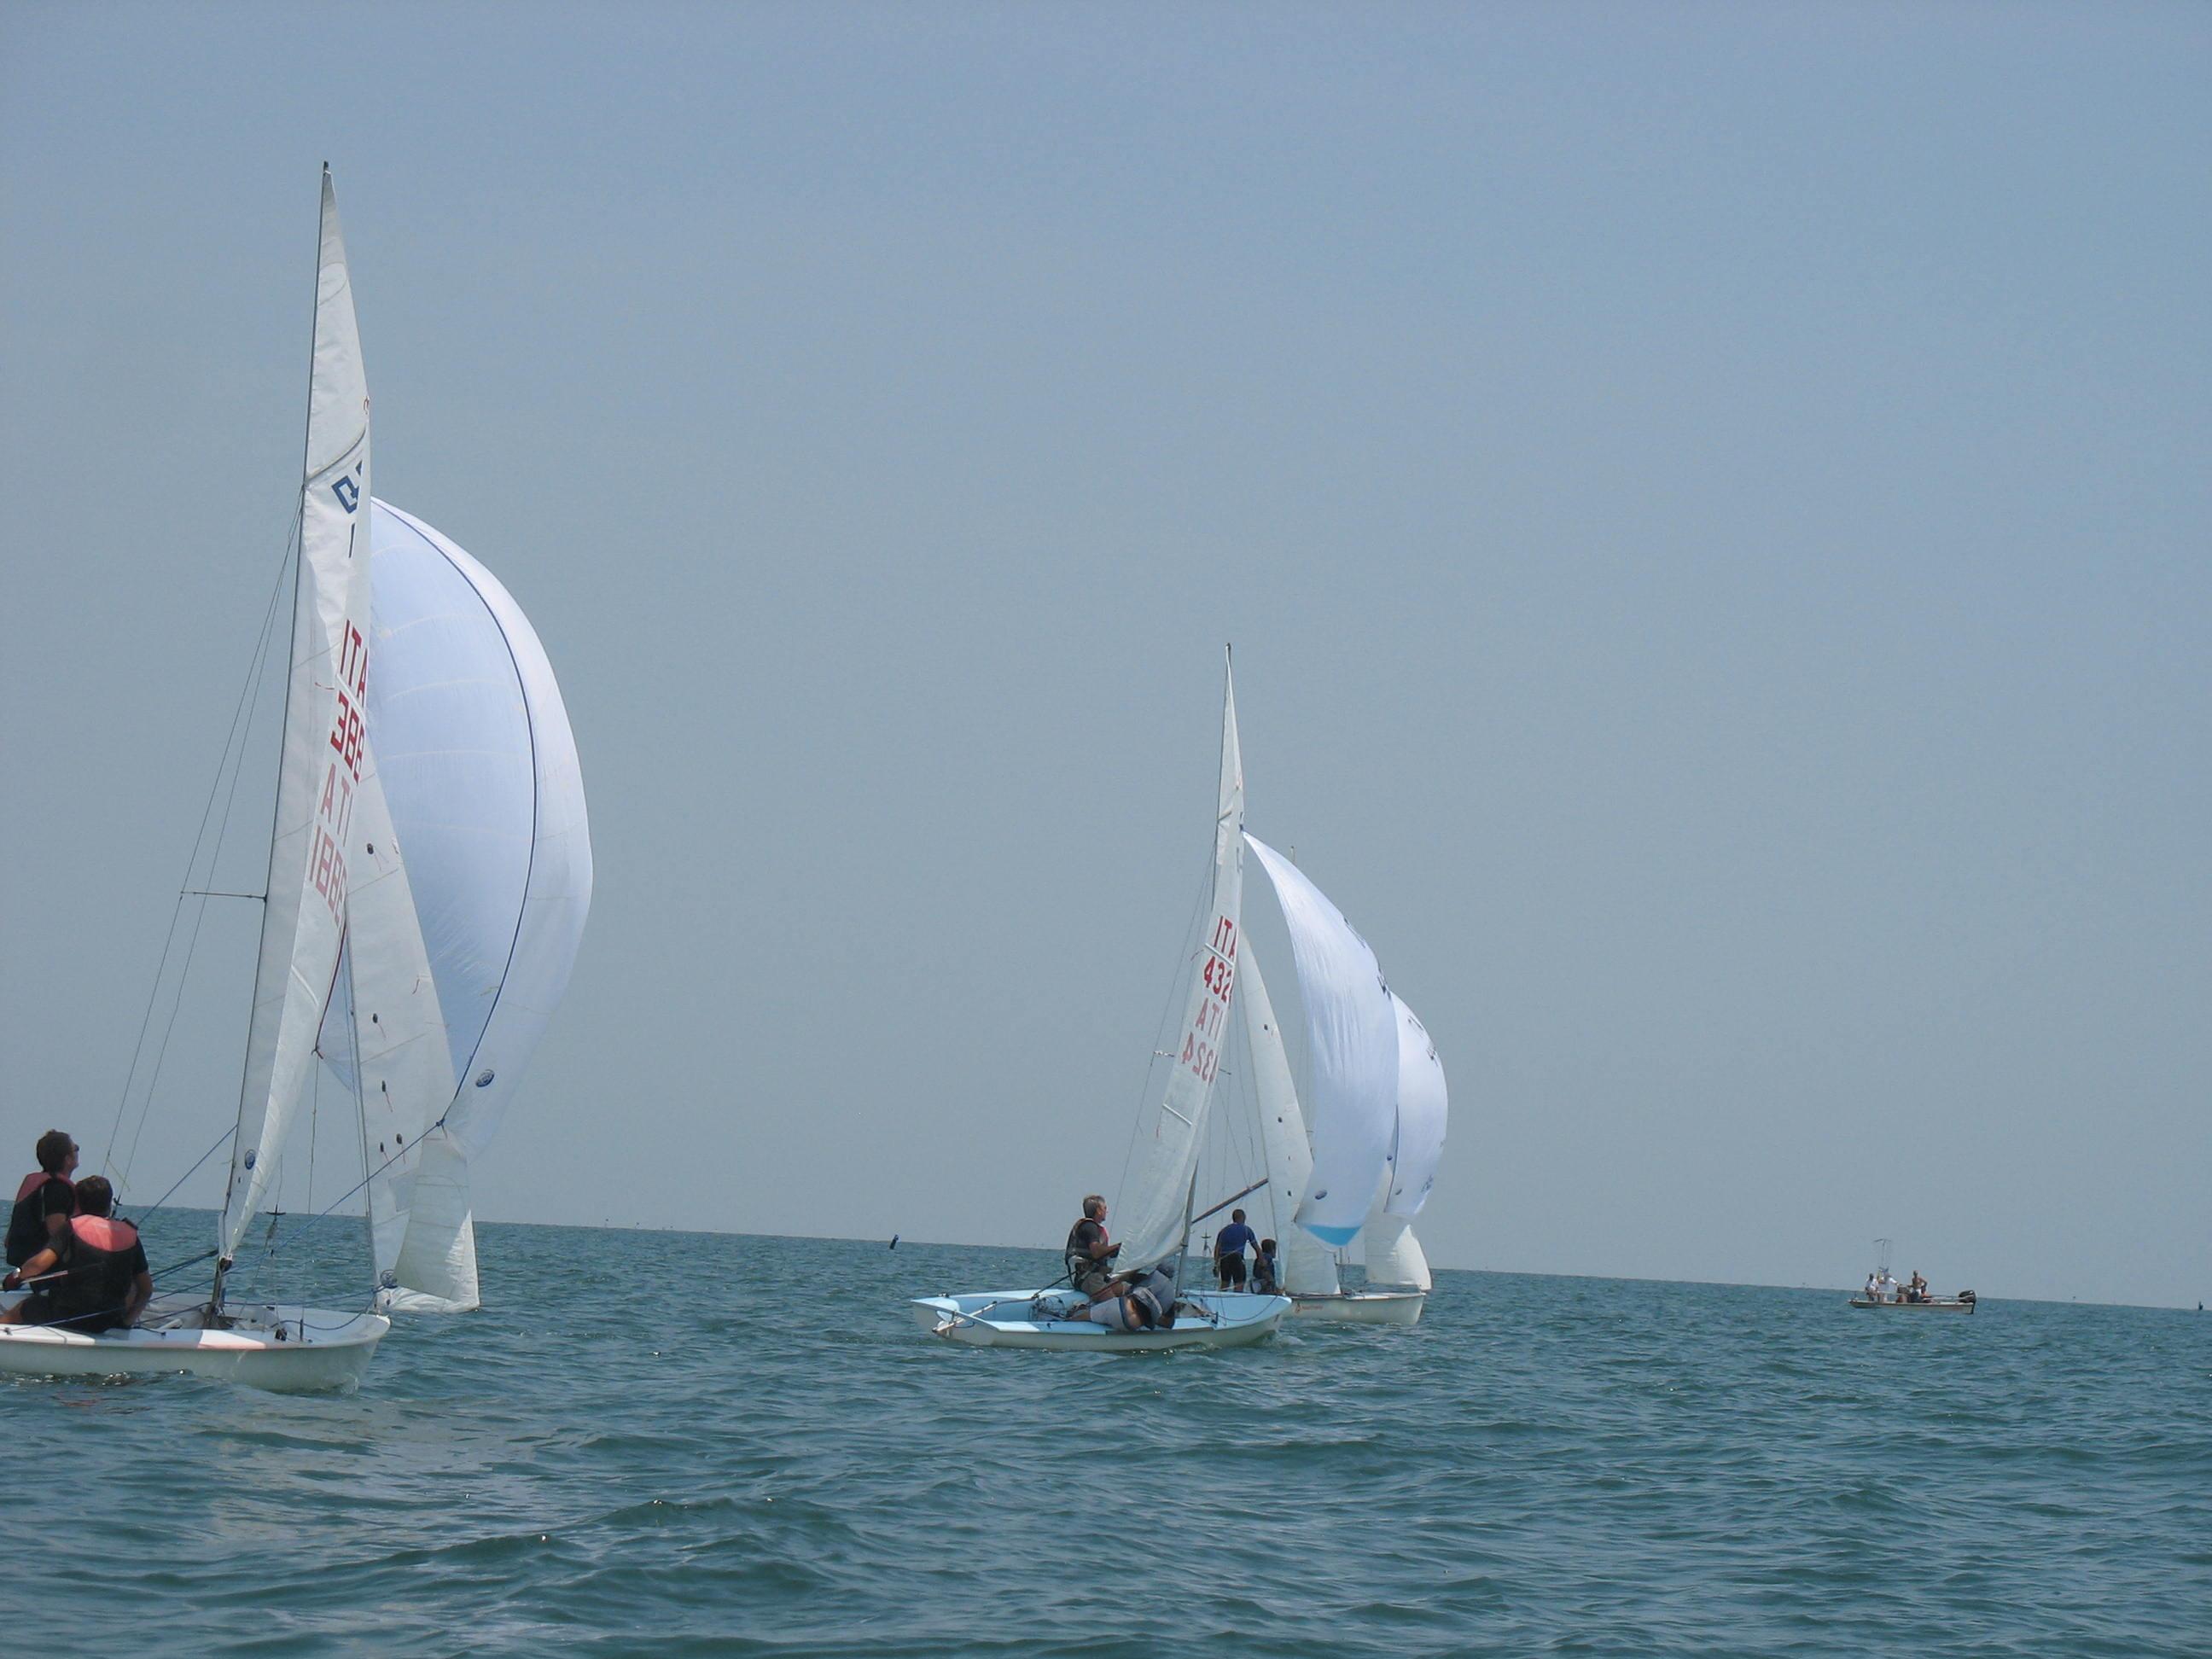 5-torneo-elia-tonelli-27062010-029